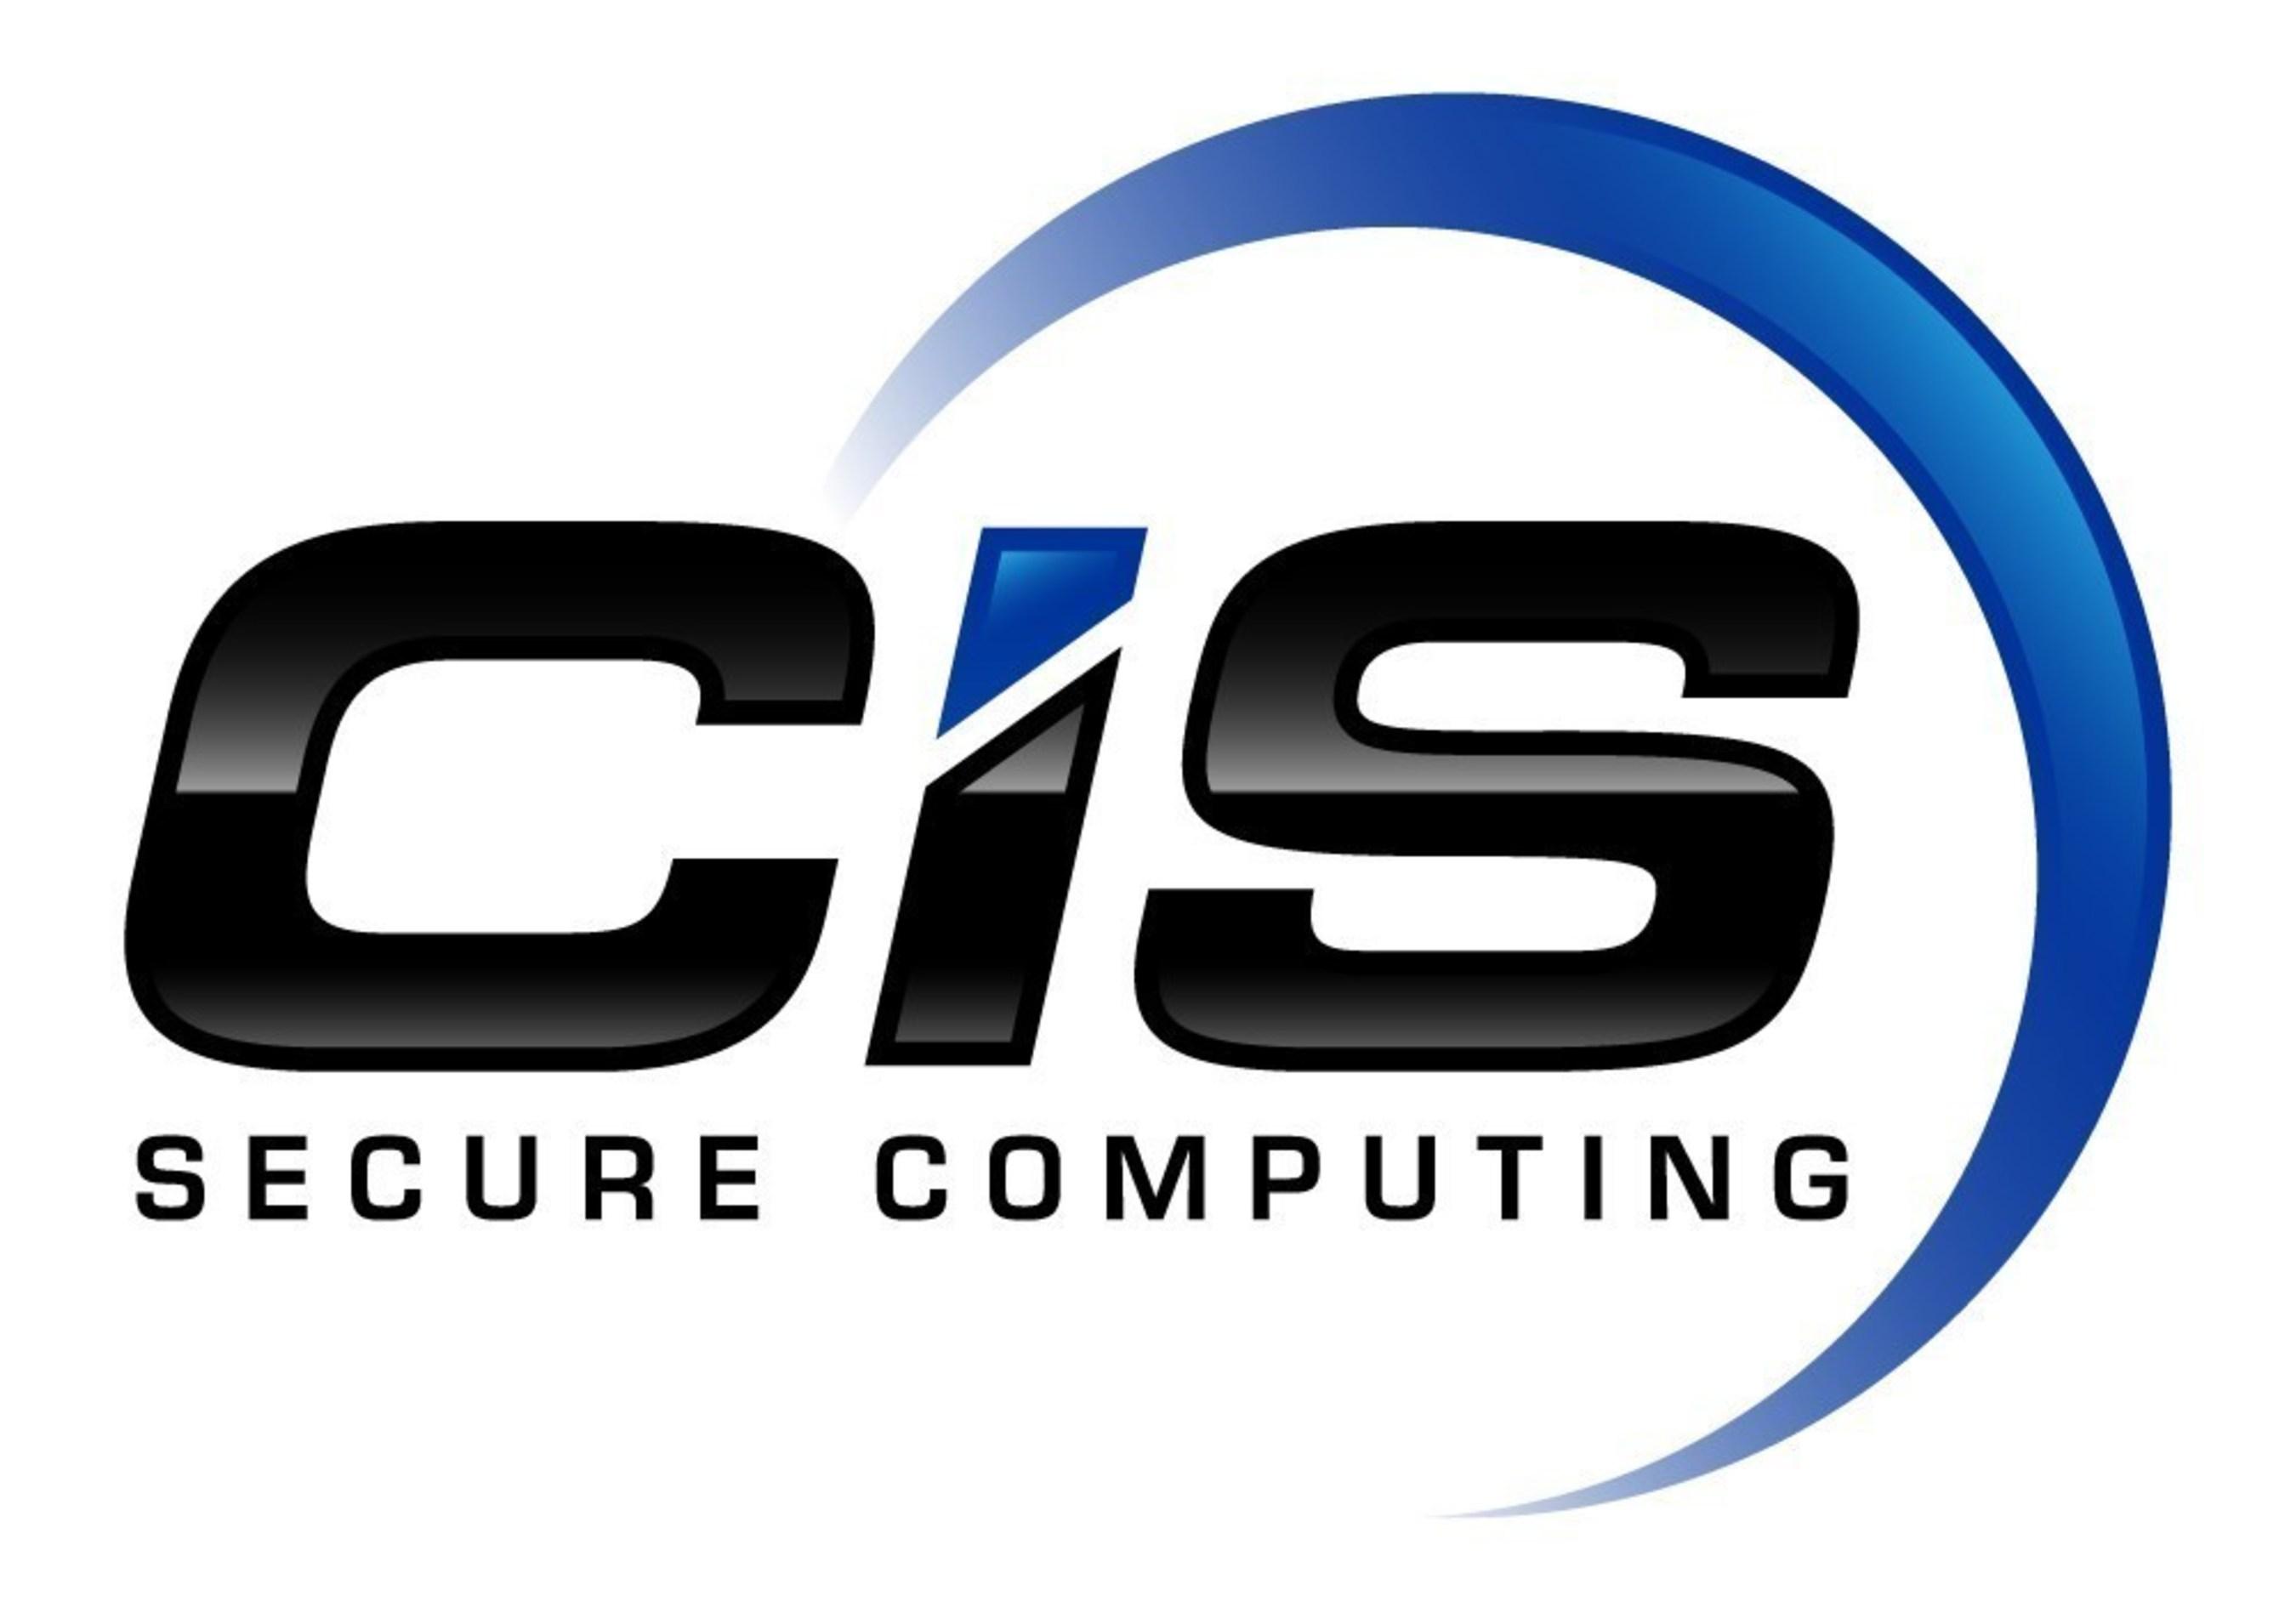 CIS Secure Computing, Inc.